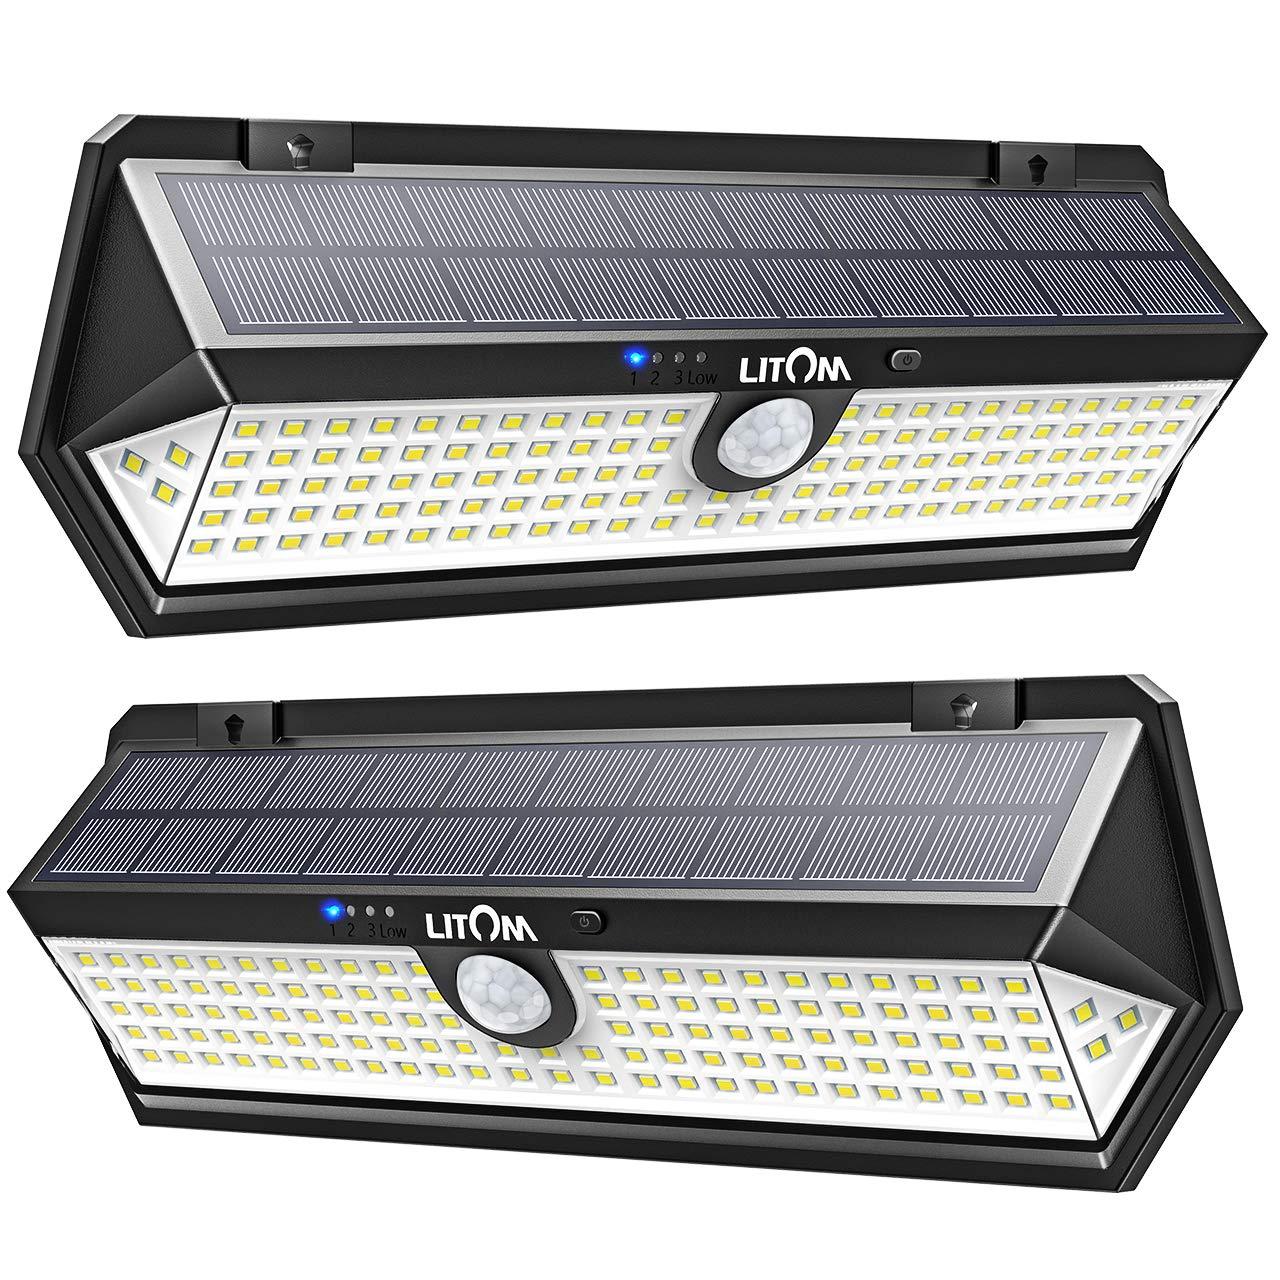 LITOM 122 LED Solar Lights Outdoor, 3 Sense Modes Auto Motion Sensor Lights with Front Switch, Indicator Lights, IP67 Waterproof Solar Security Light for Door, Garden, Deck, Porch-2 Pack by LITOM